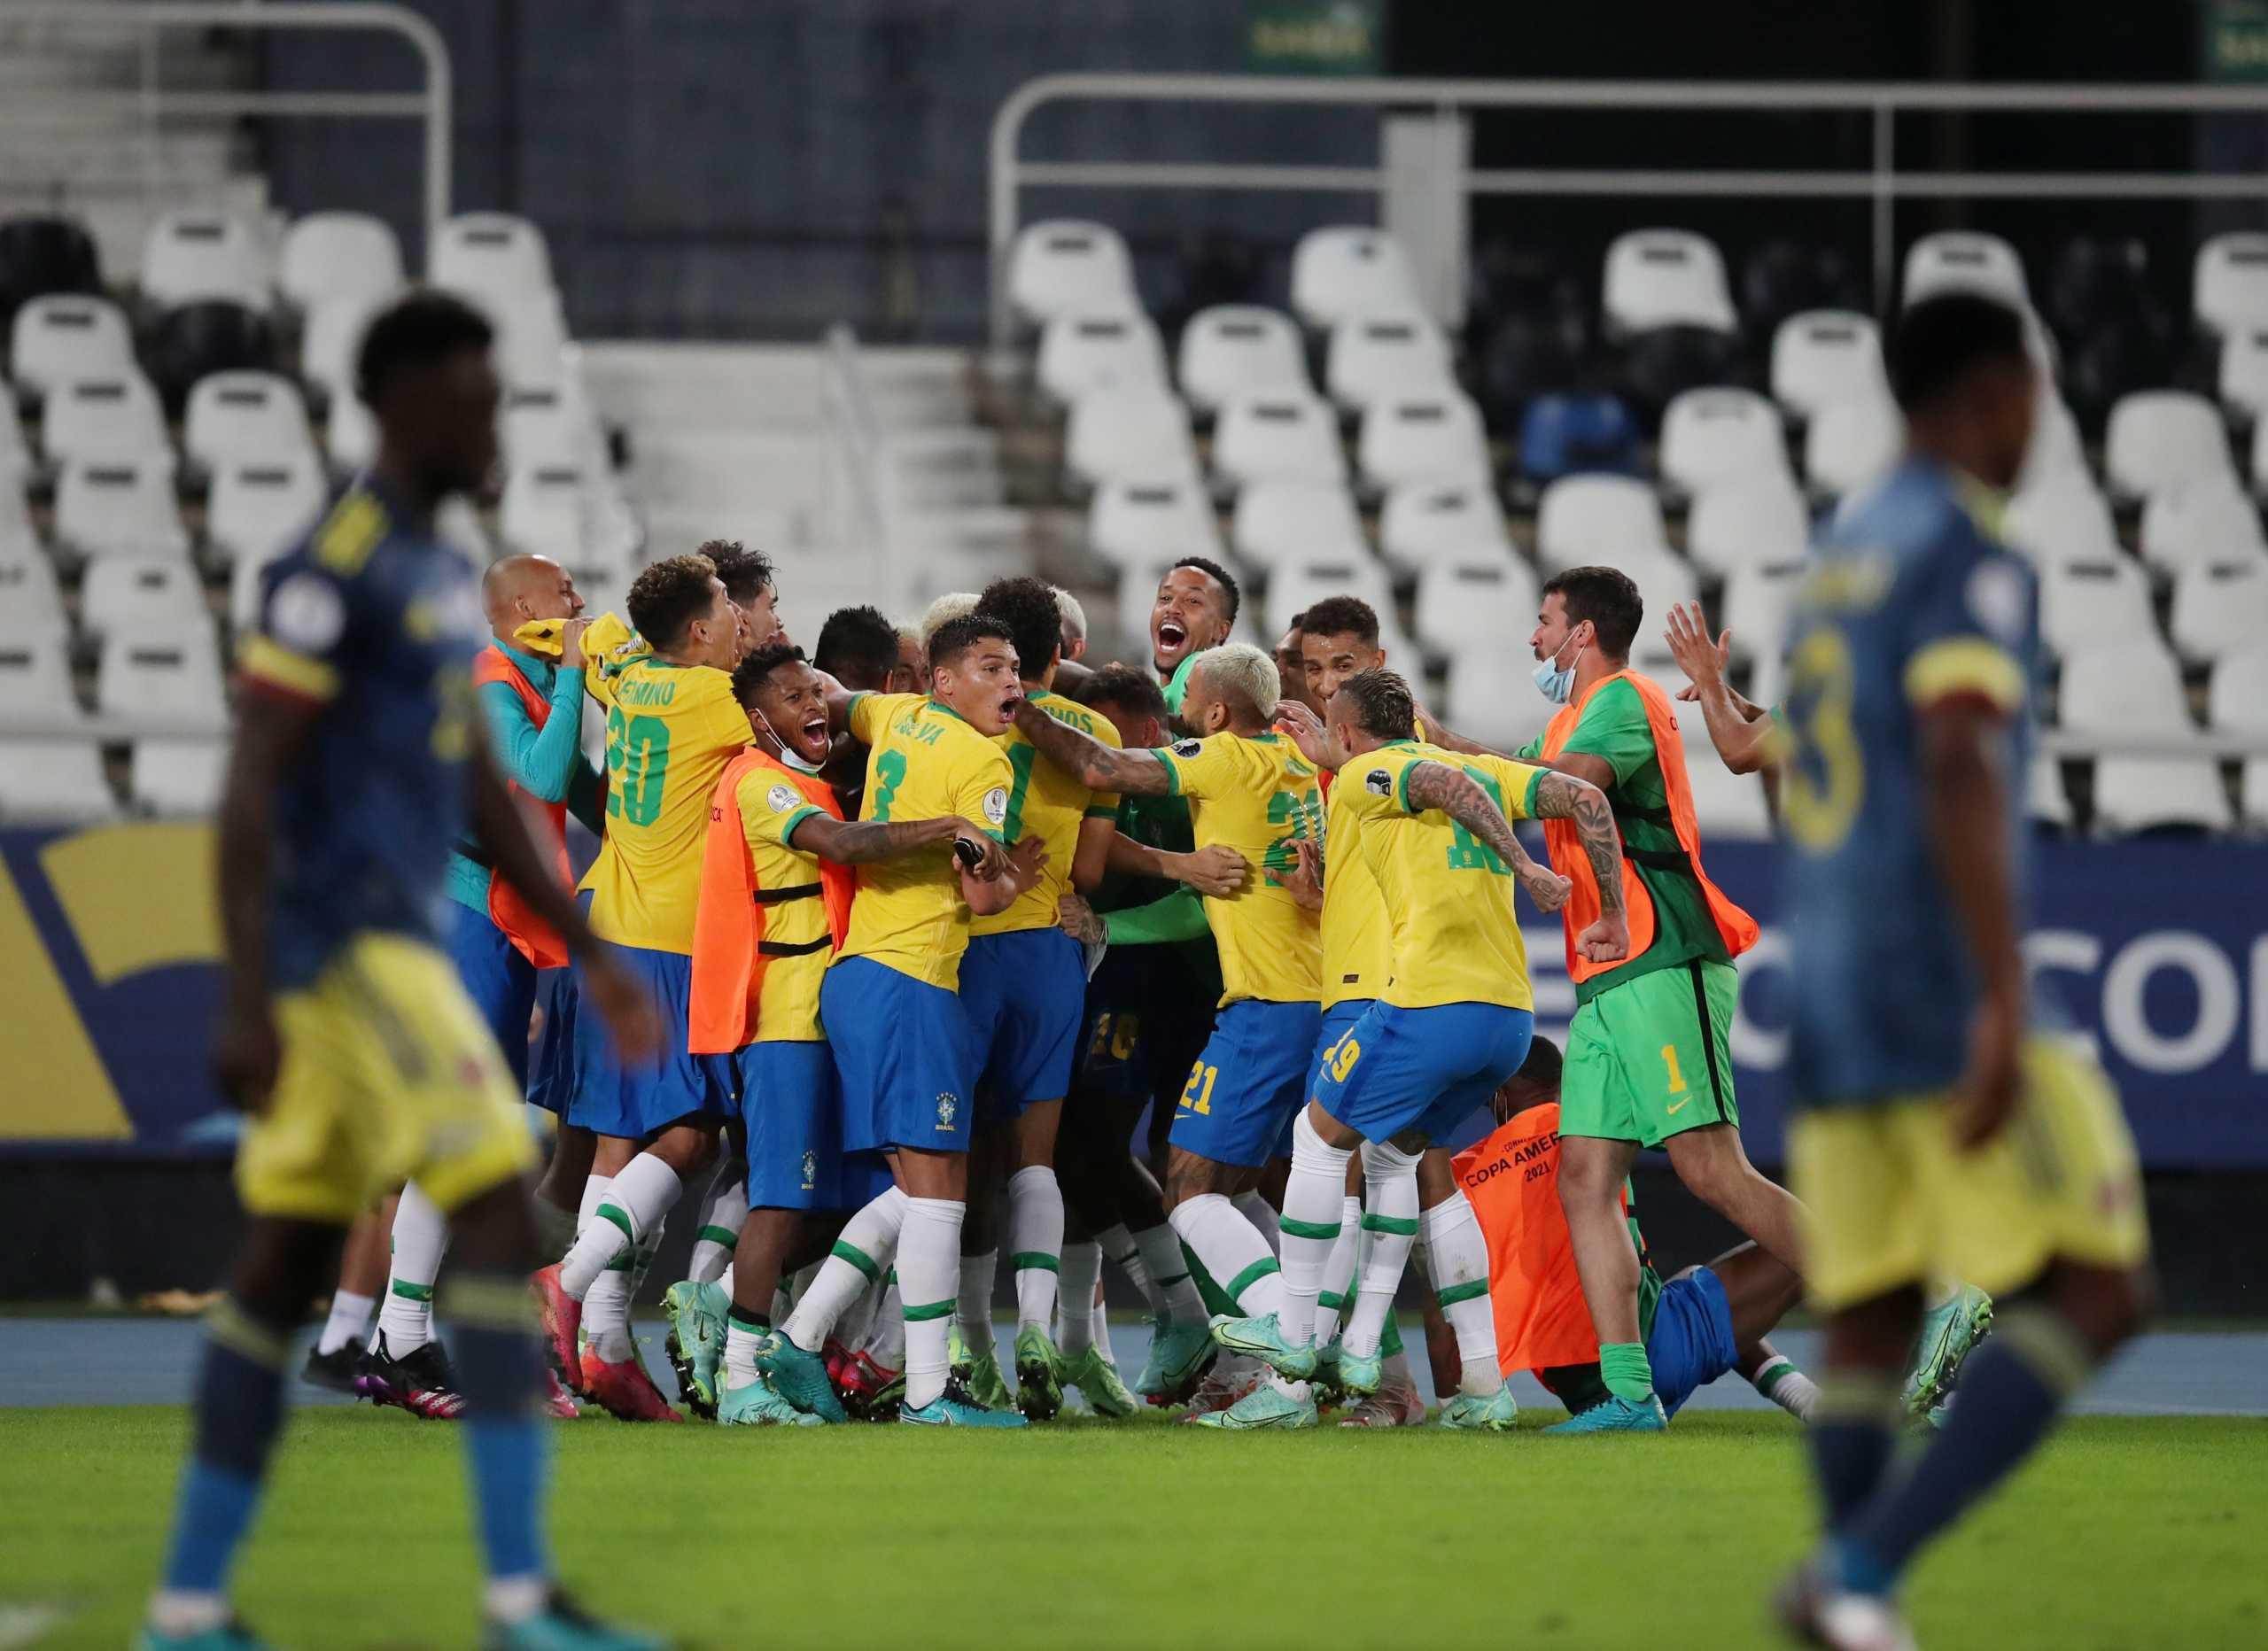 Copa America: Με ανατροπή στο 100ο λεπτό η Βραζιλία νίκησε την Κολομβία